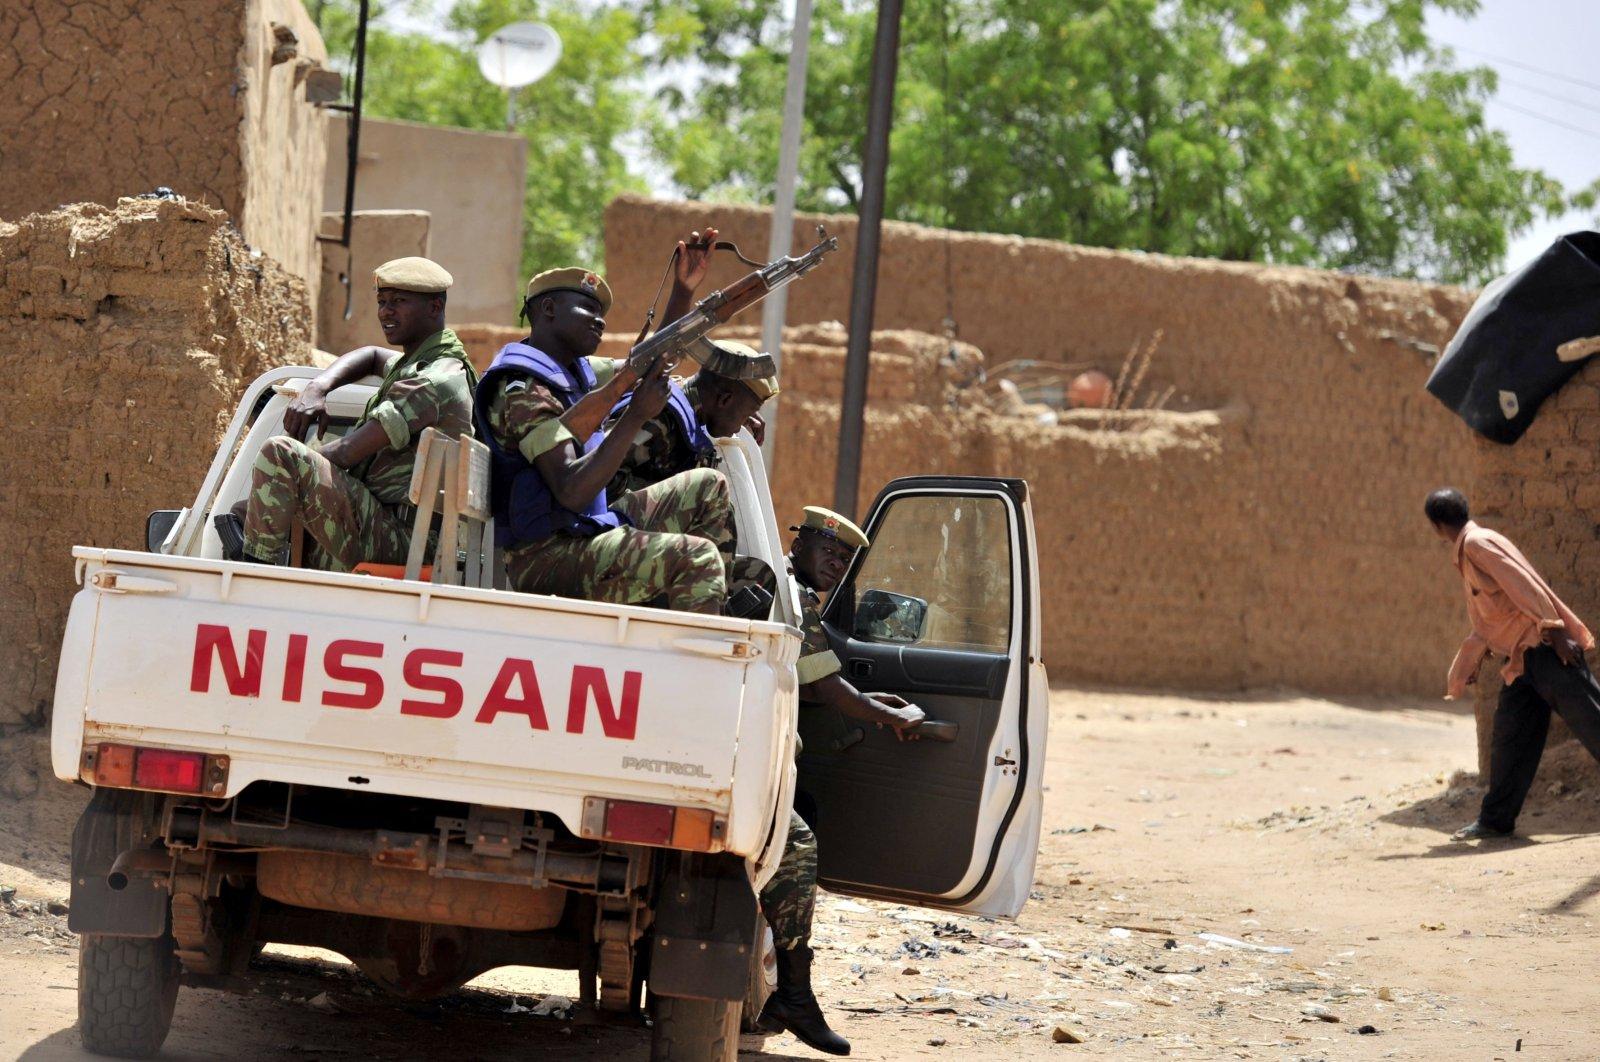 Burkinabe soldiers patrol in a pickup truck in Gorom-Gorom, northern Burkina Faso, June 27, 2012. (AFP Photo)